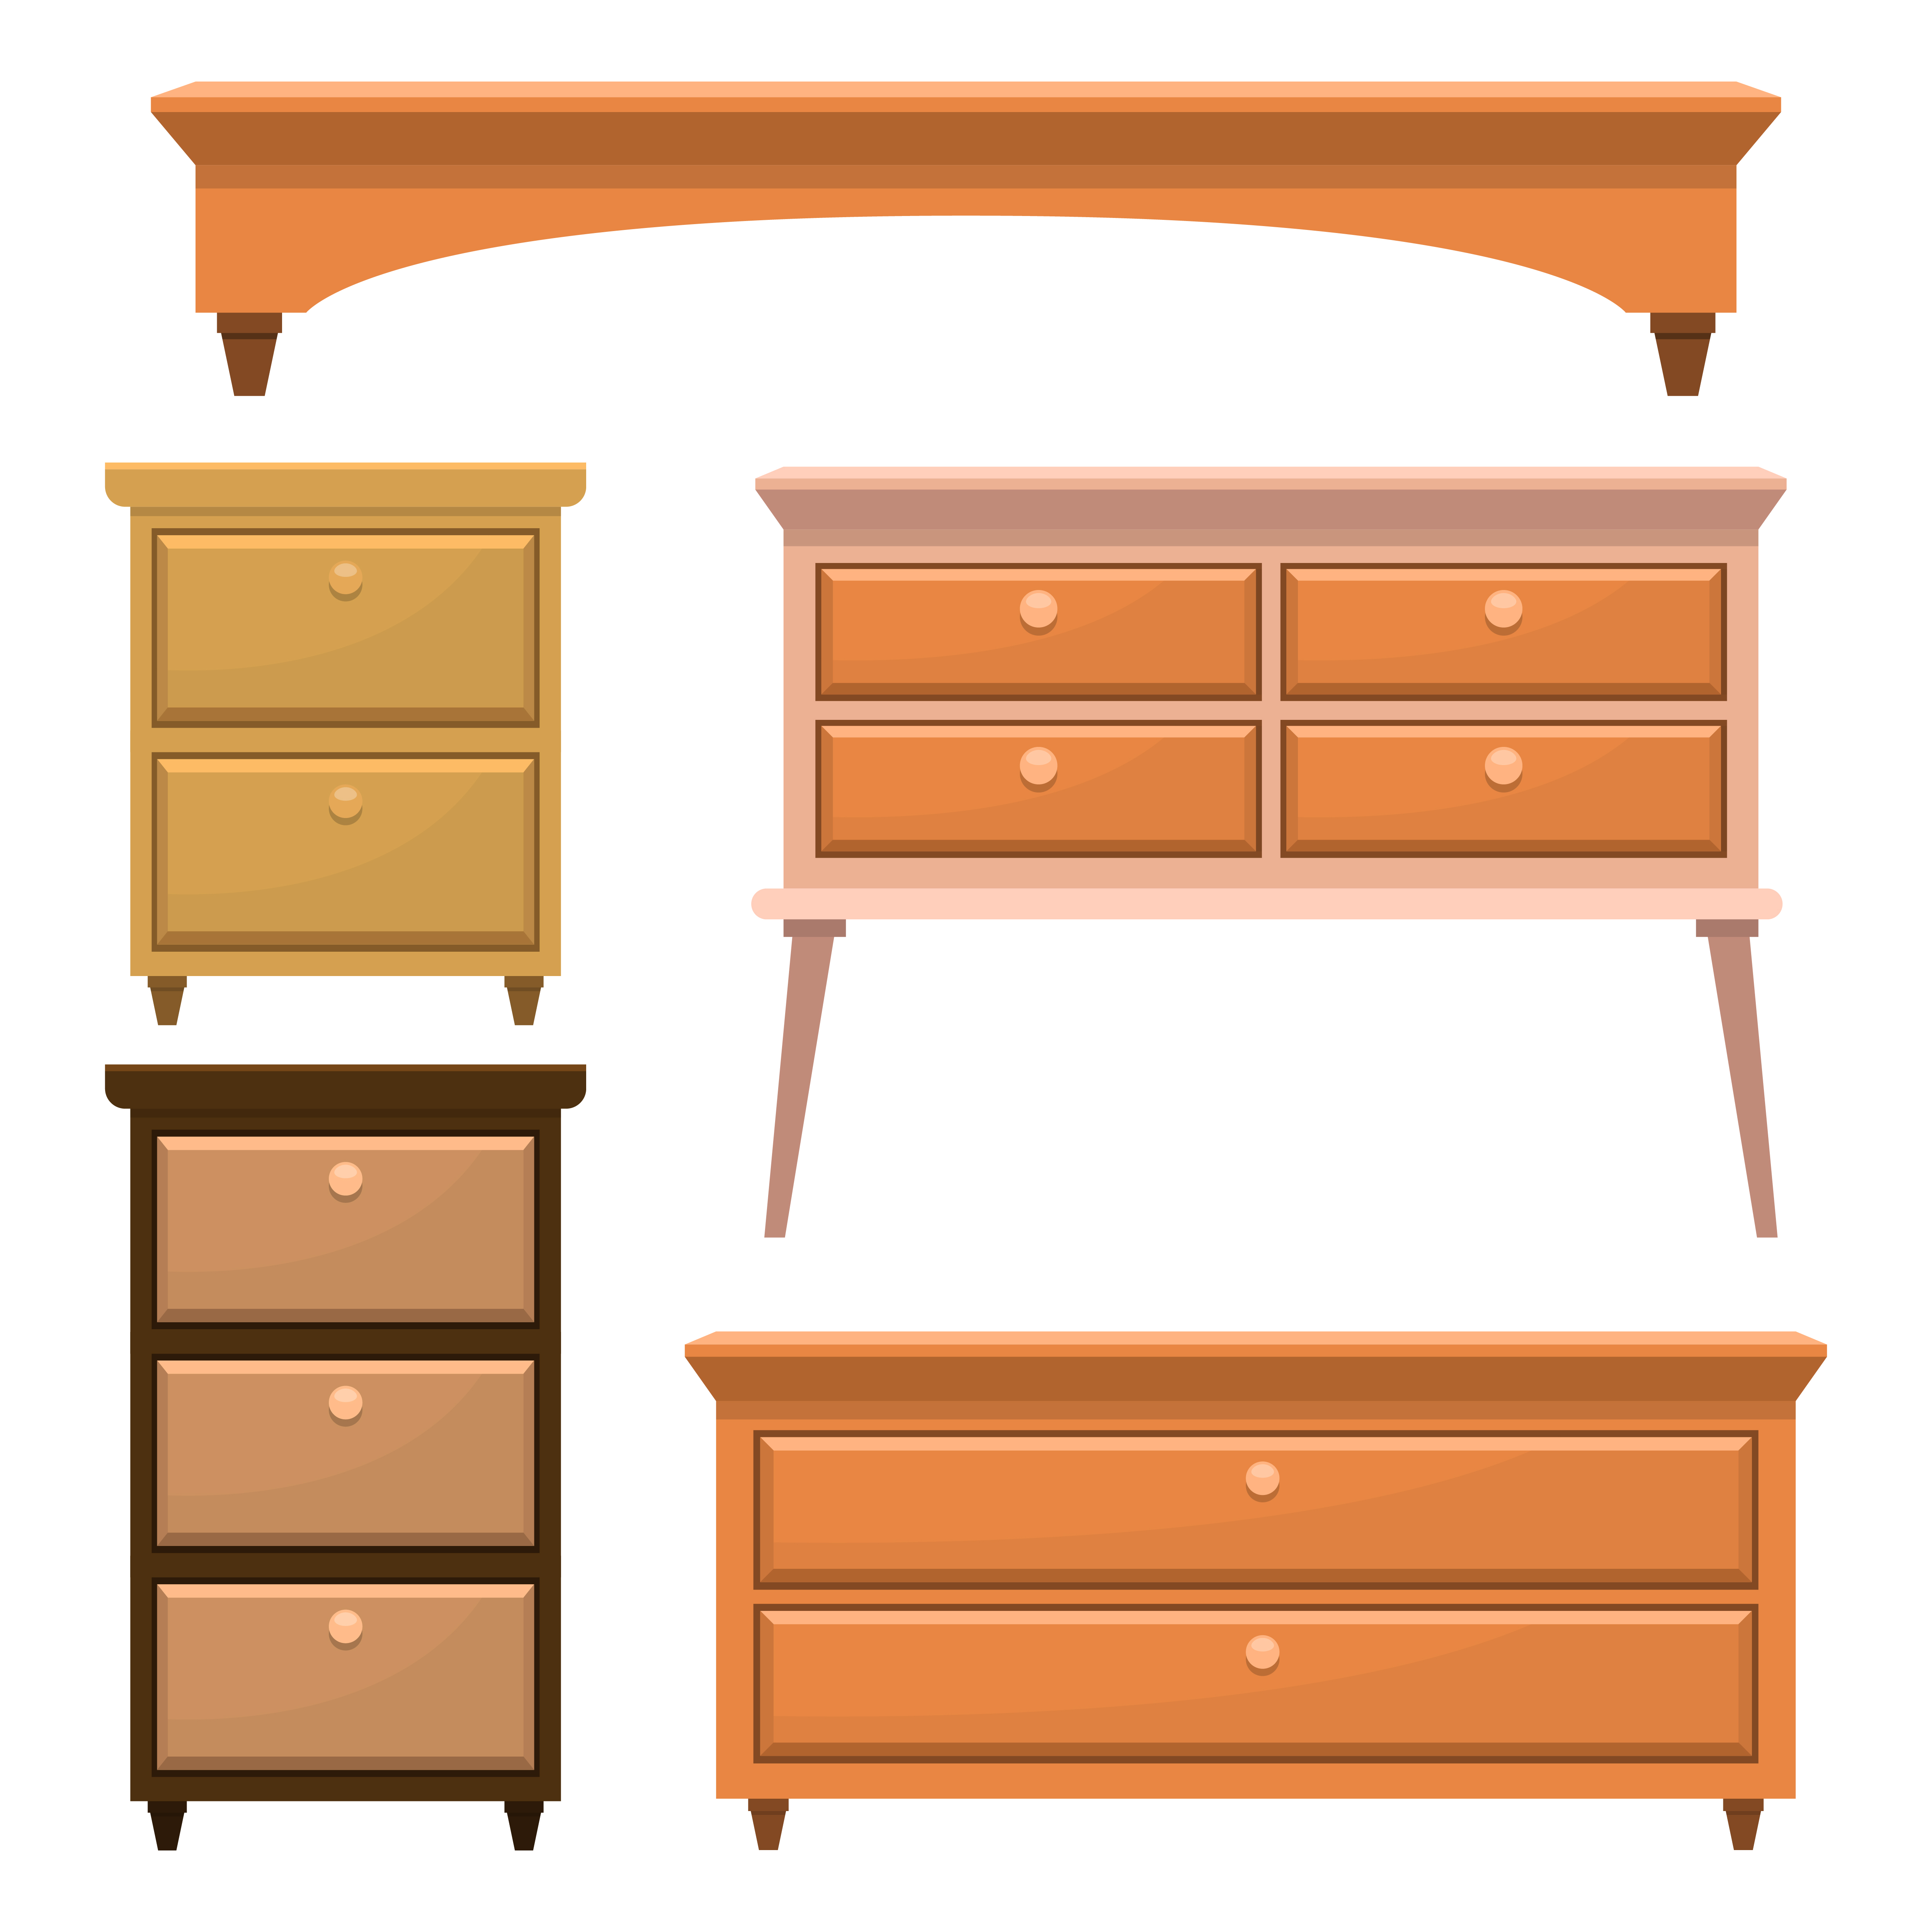 Retro wooden bedroom furniture - Download Free Vectors, Clipart